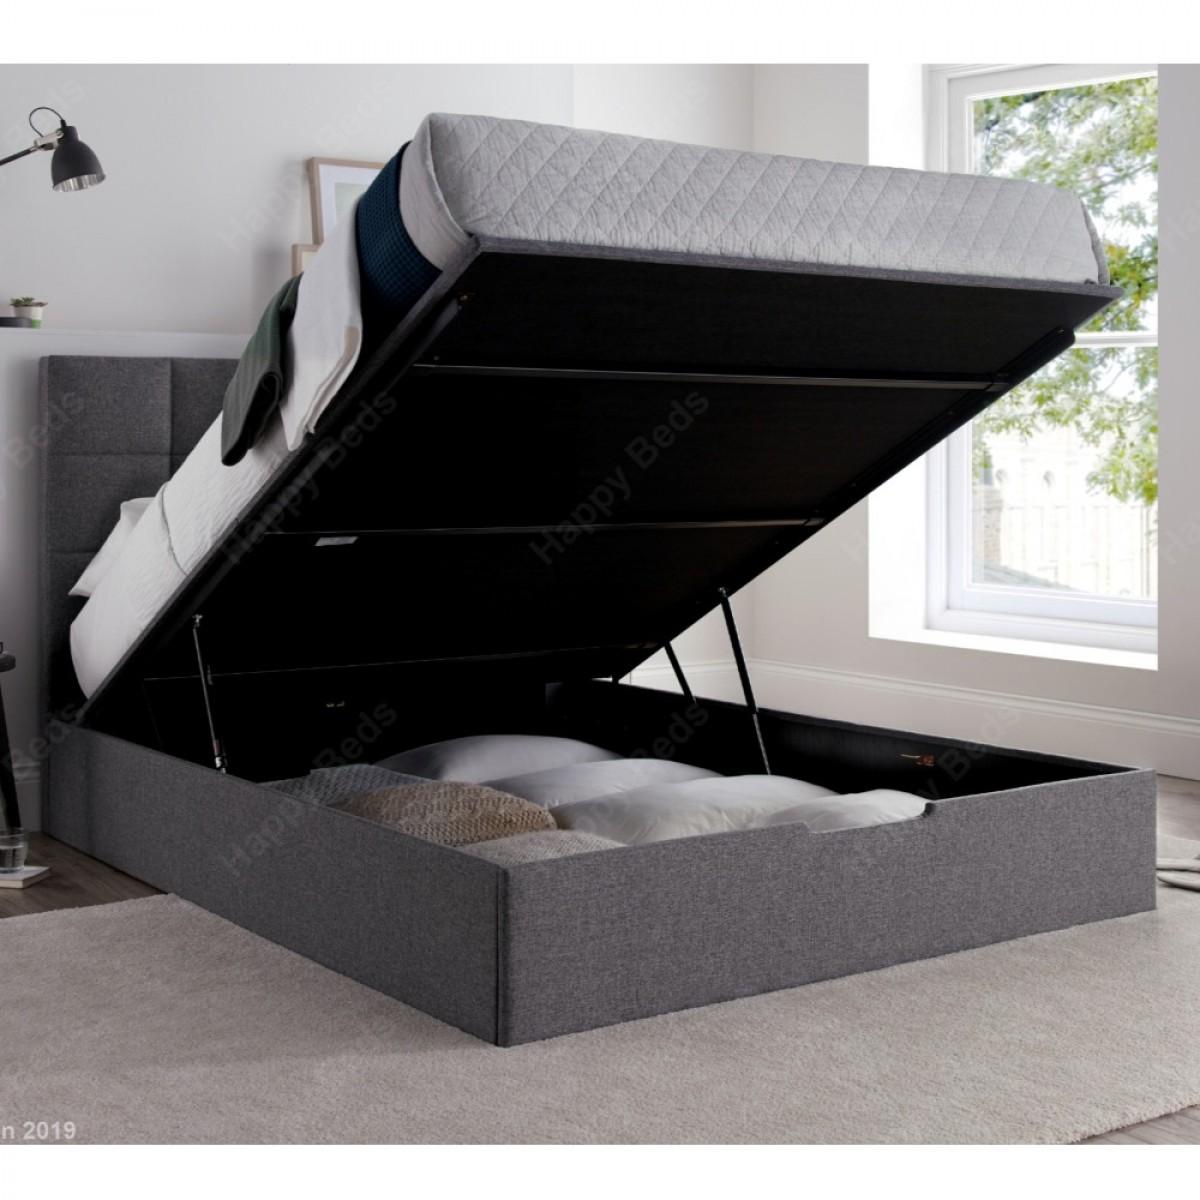 Whitburn Grey Fabric Ottoman Storage Bed